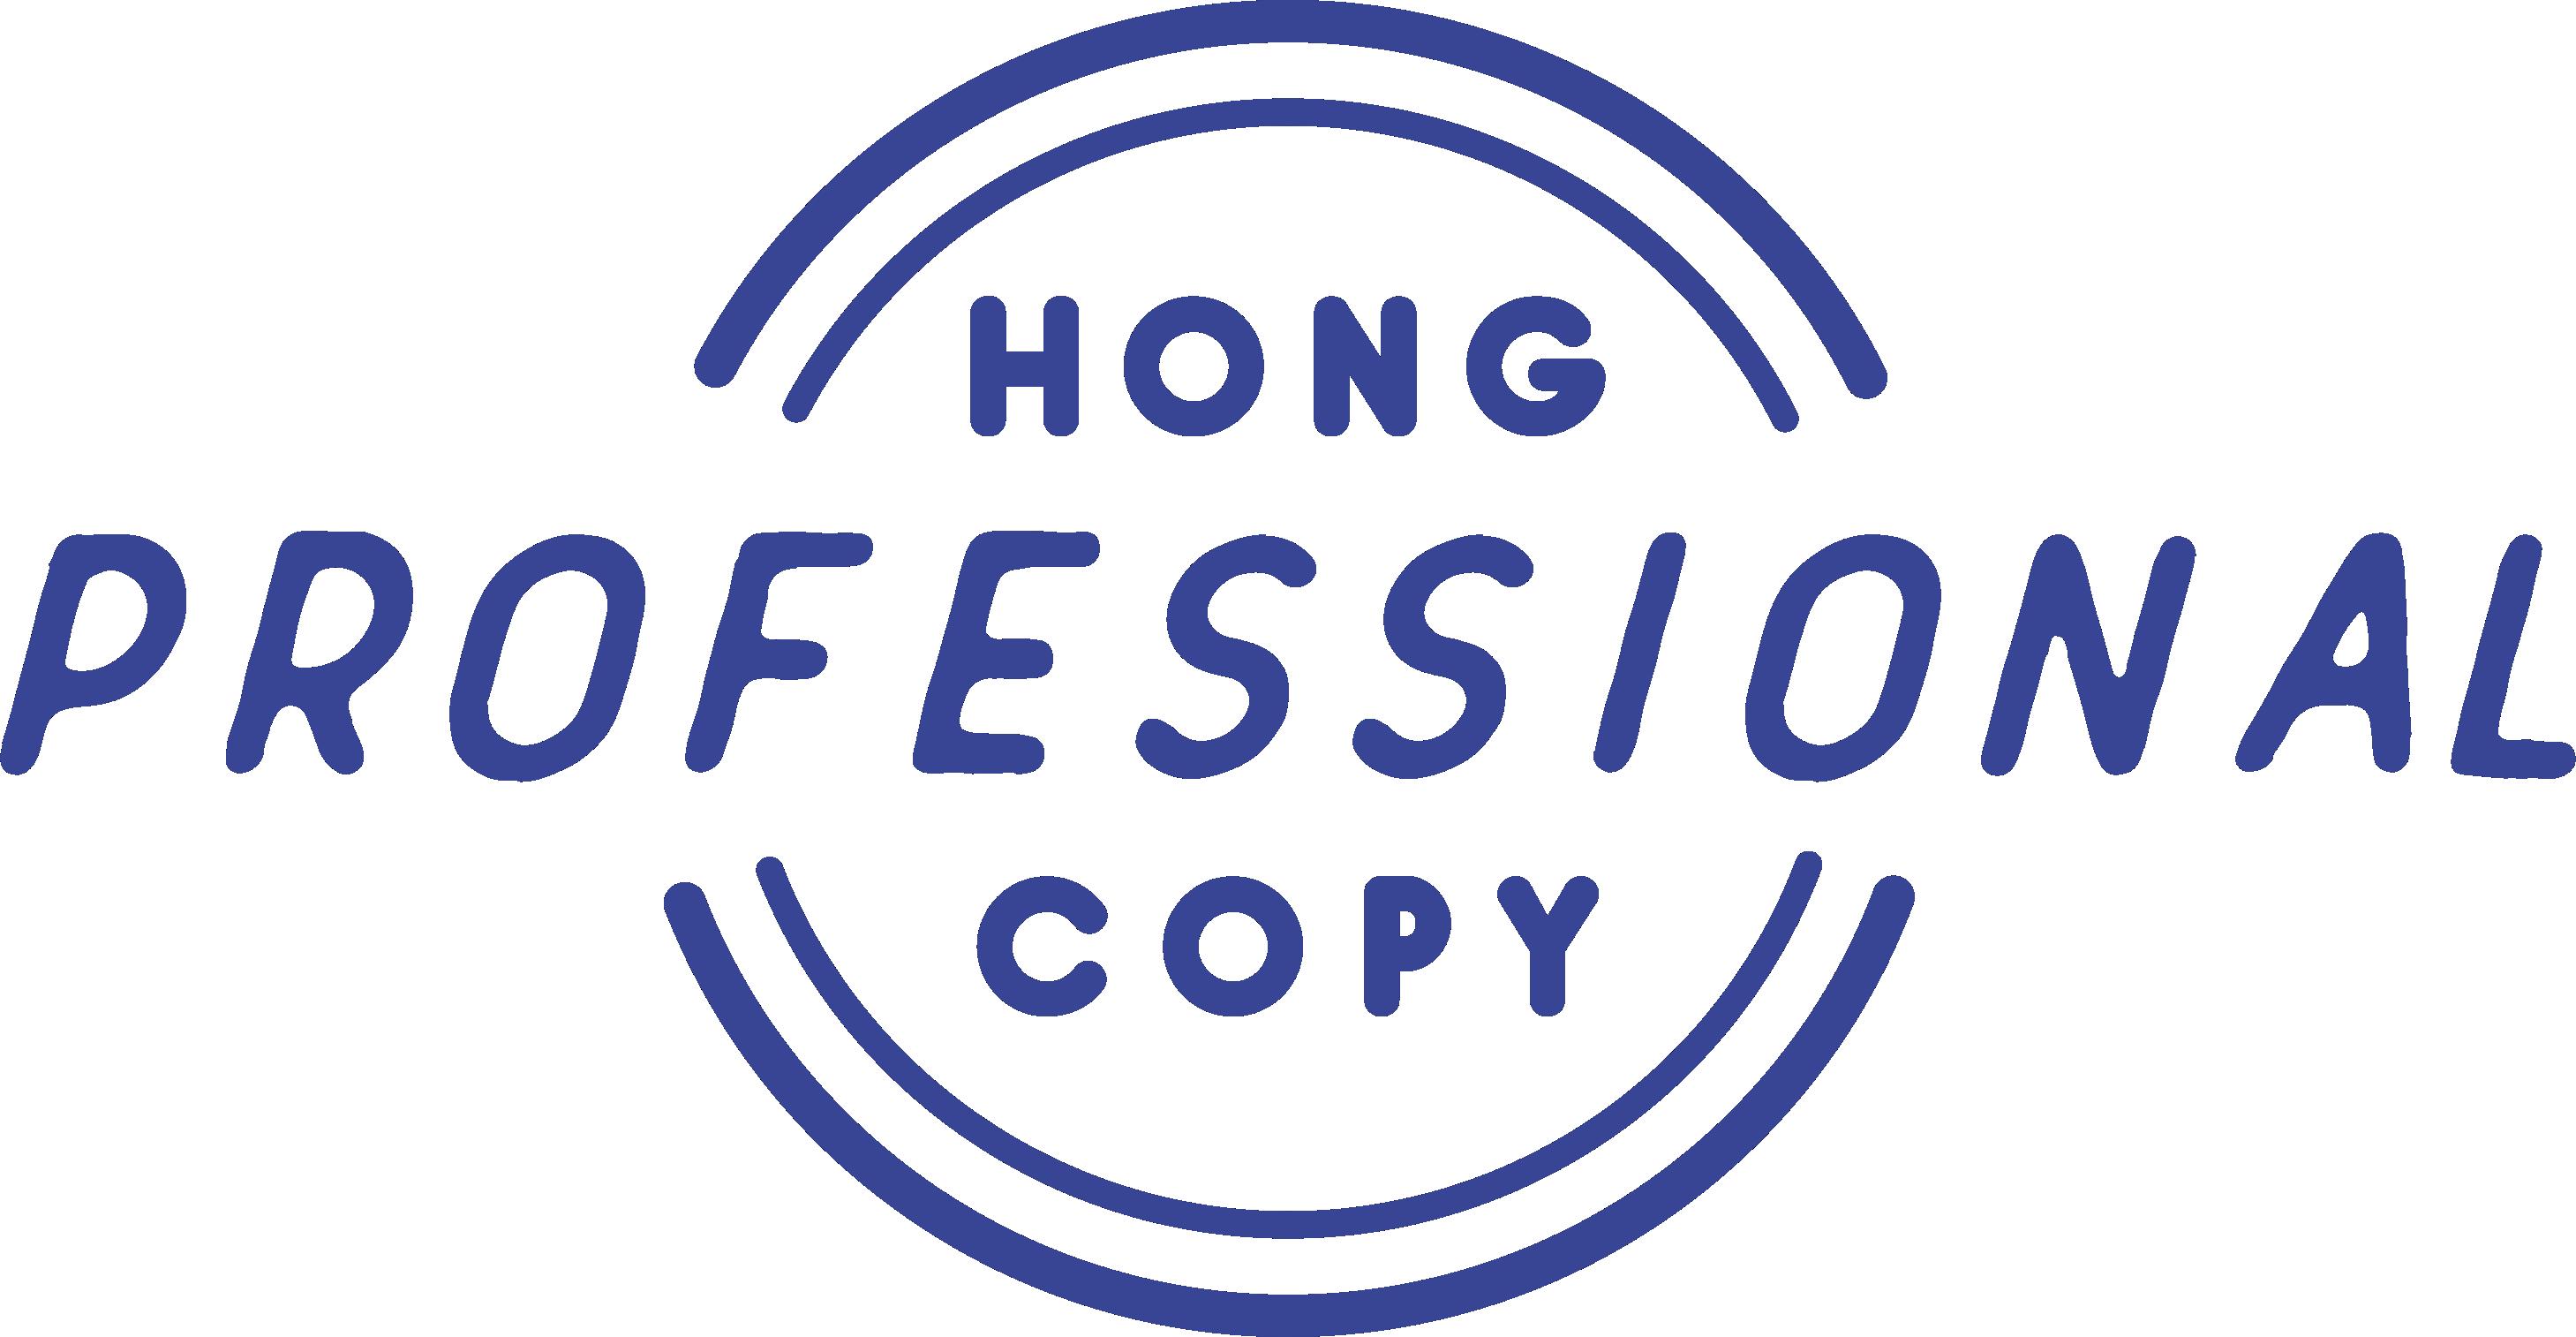 Hong Professional Copywriting